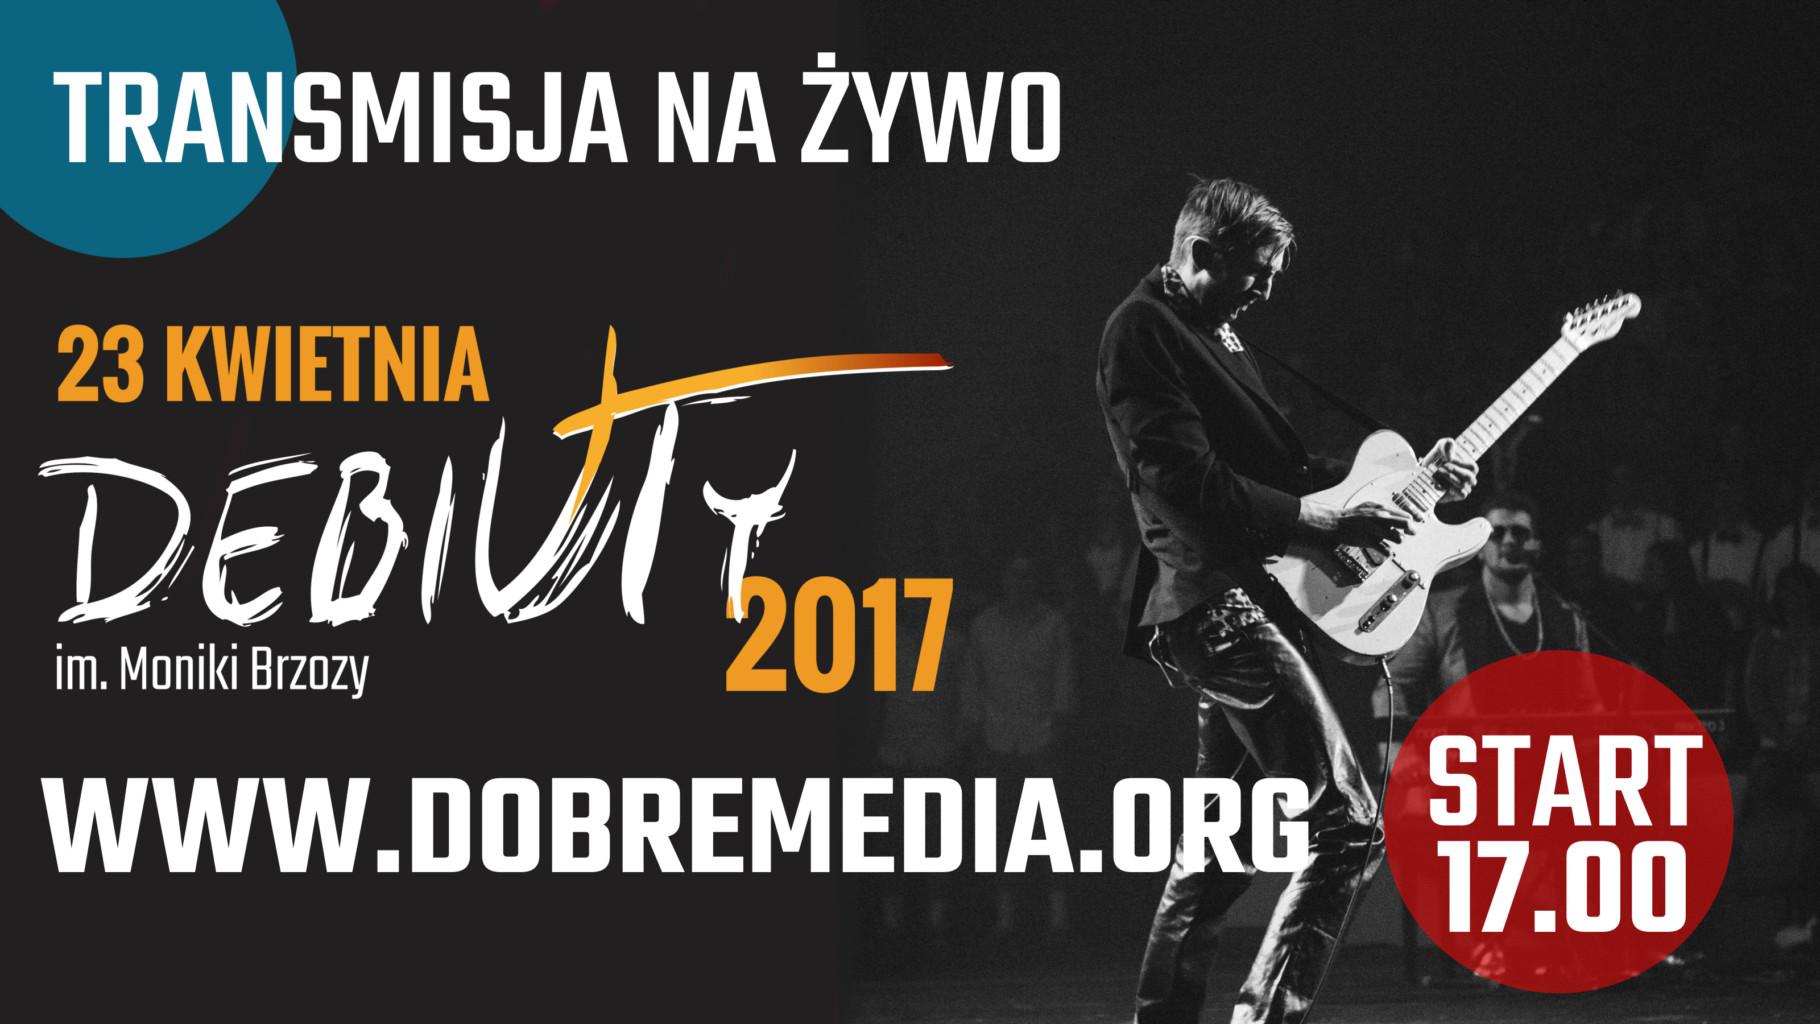 Debiuty 2017 - transmisja LIVE Dobremedia.org